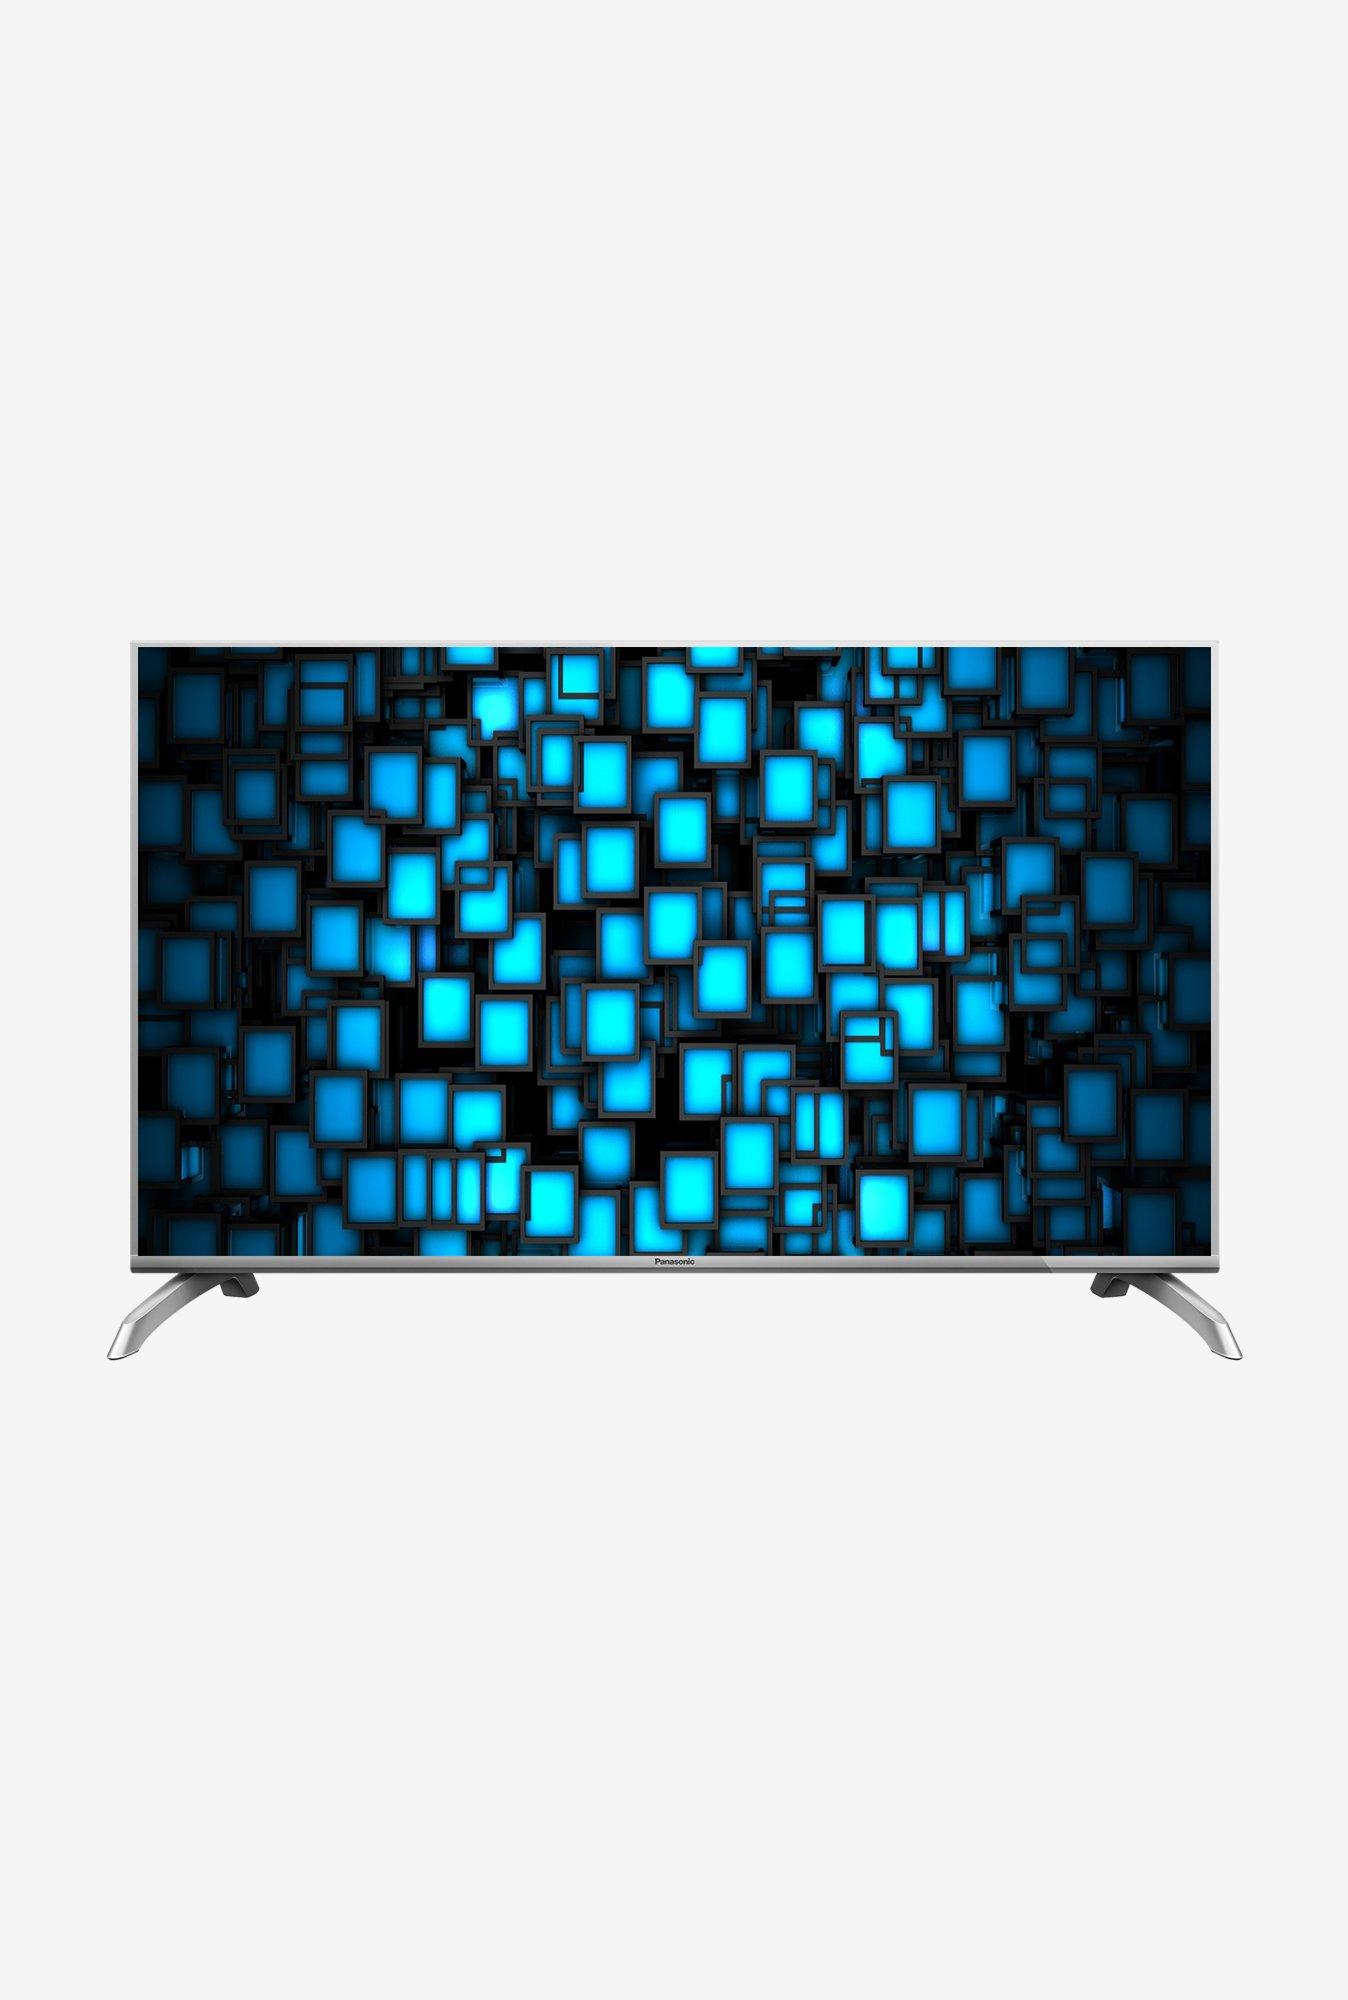 Buy Panasonic TH 58D300DX 147cm 58 Inch Full HD LED TV